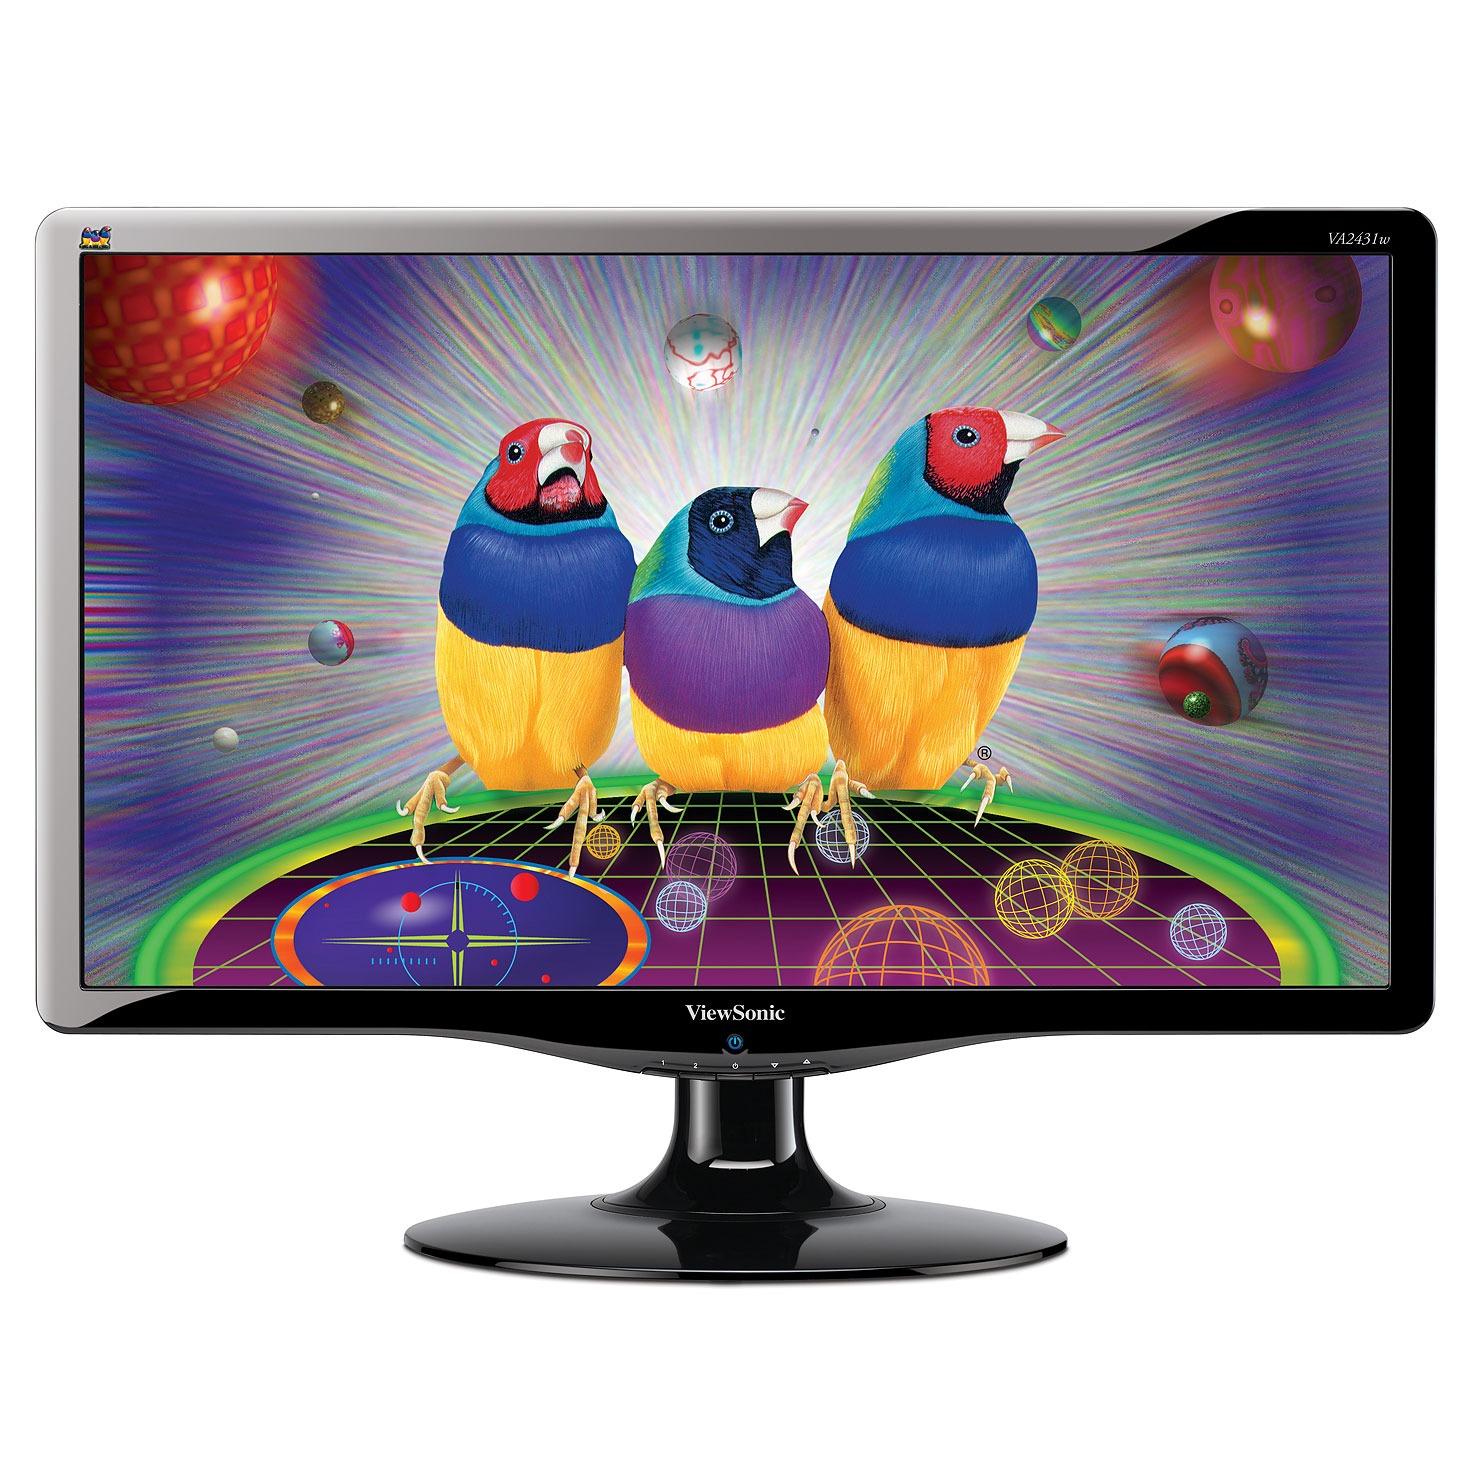 "Ecran PC ViewSonic VA2431w ViewSonic 24"" LCD -VA2431w - 5 ms - Format Large 16/9 (garantie constructeur 3 ans)"